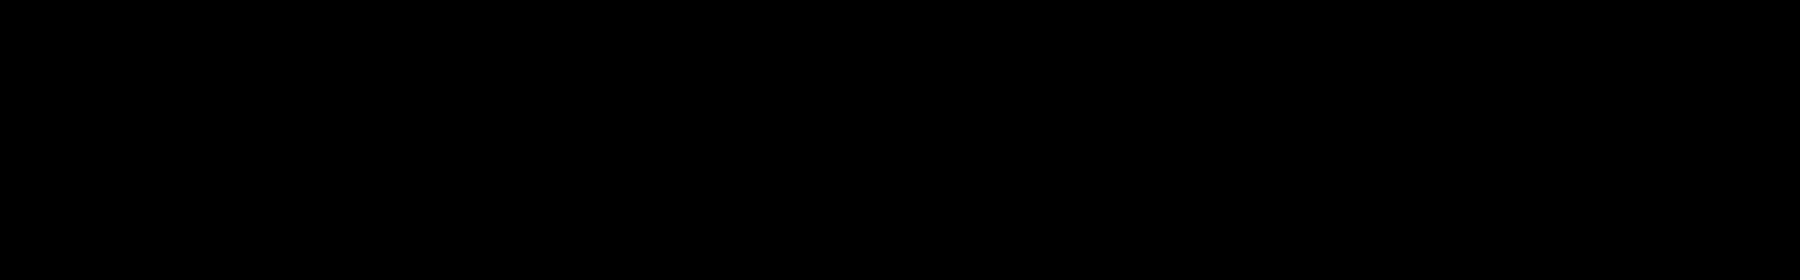 Glow (Ableton Live Template) audio waveform